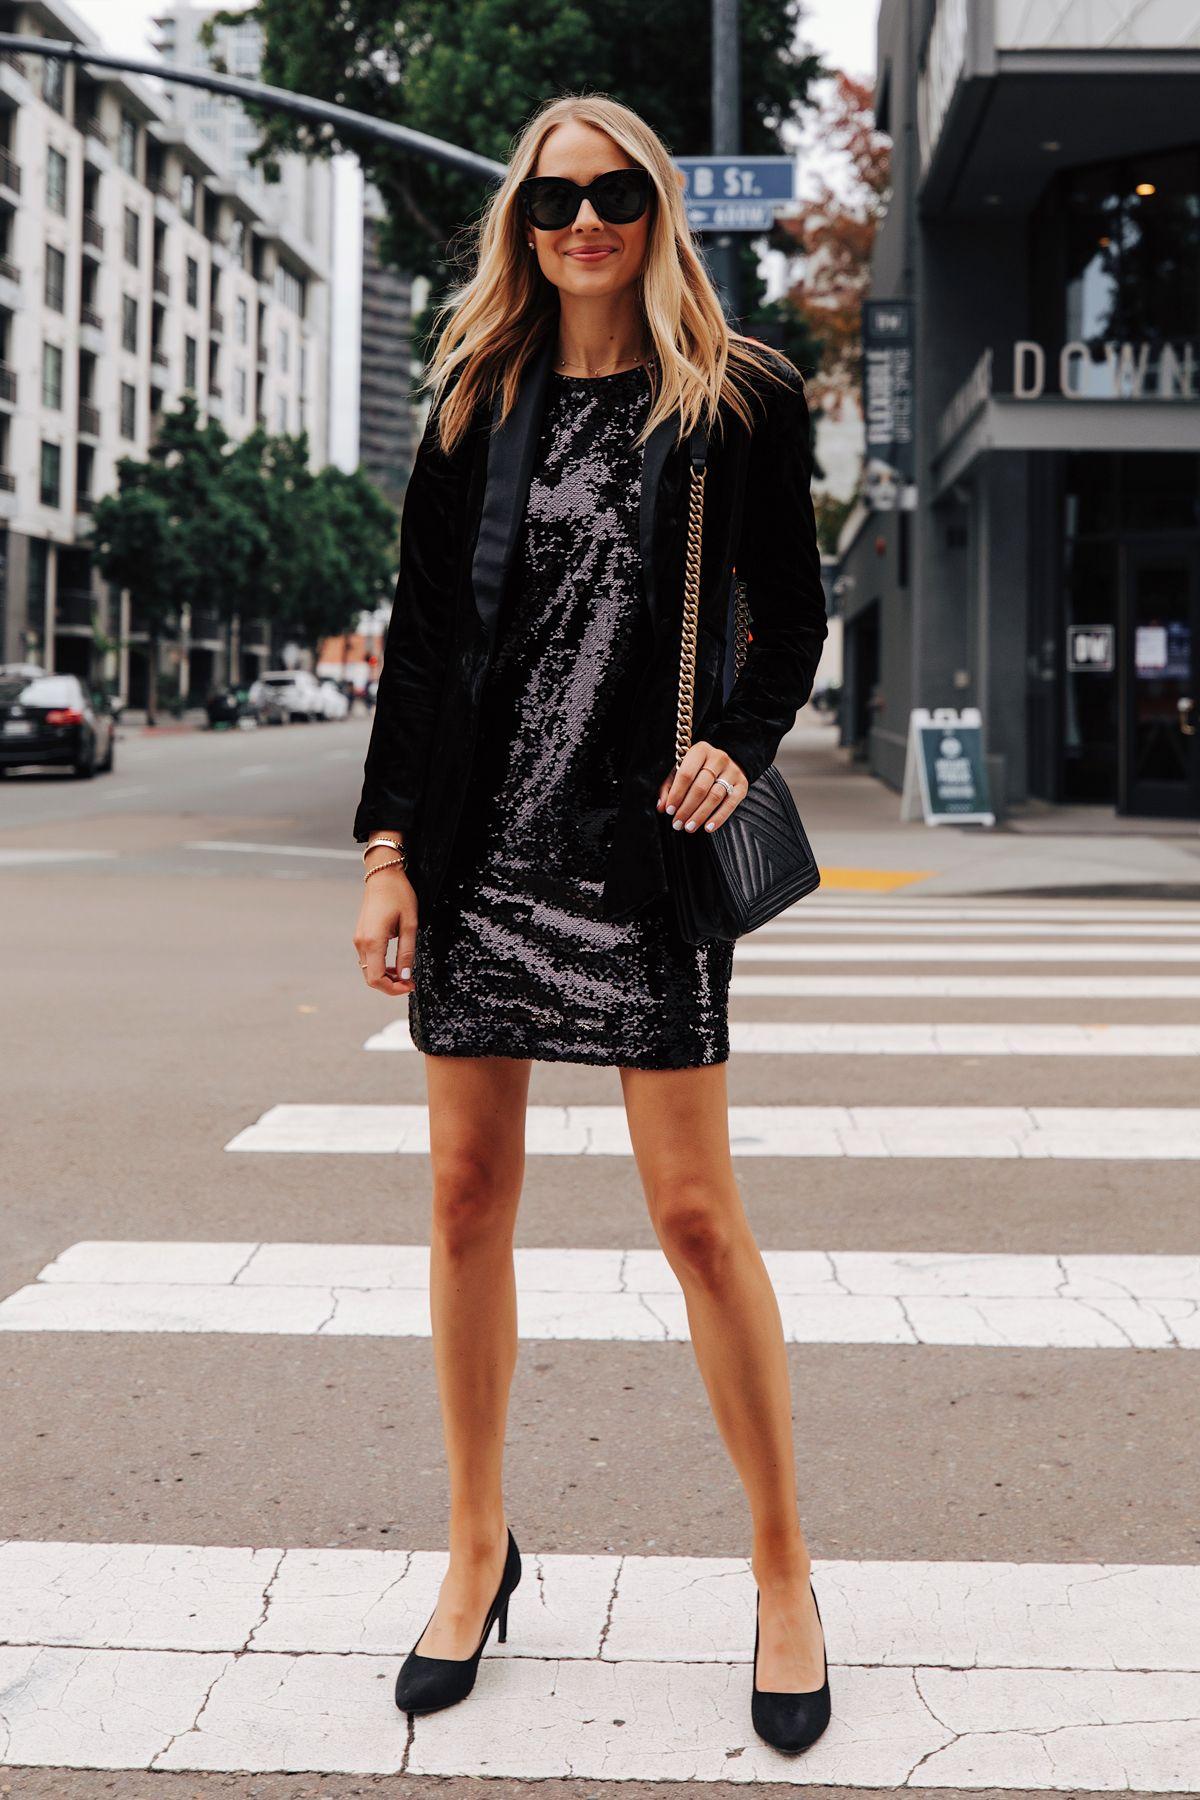 Fashion Jackson Wearing Walmart Black Velvet Blazer Black Sequin Dress Black Pumps Fashion Jackson Fashion Outfits [ 1800 x 1200 Pixel ]